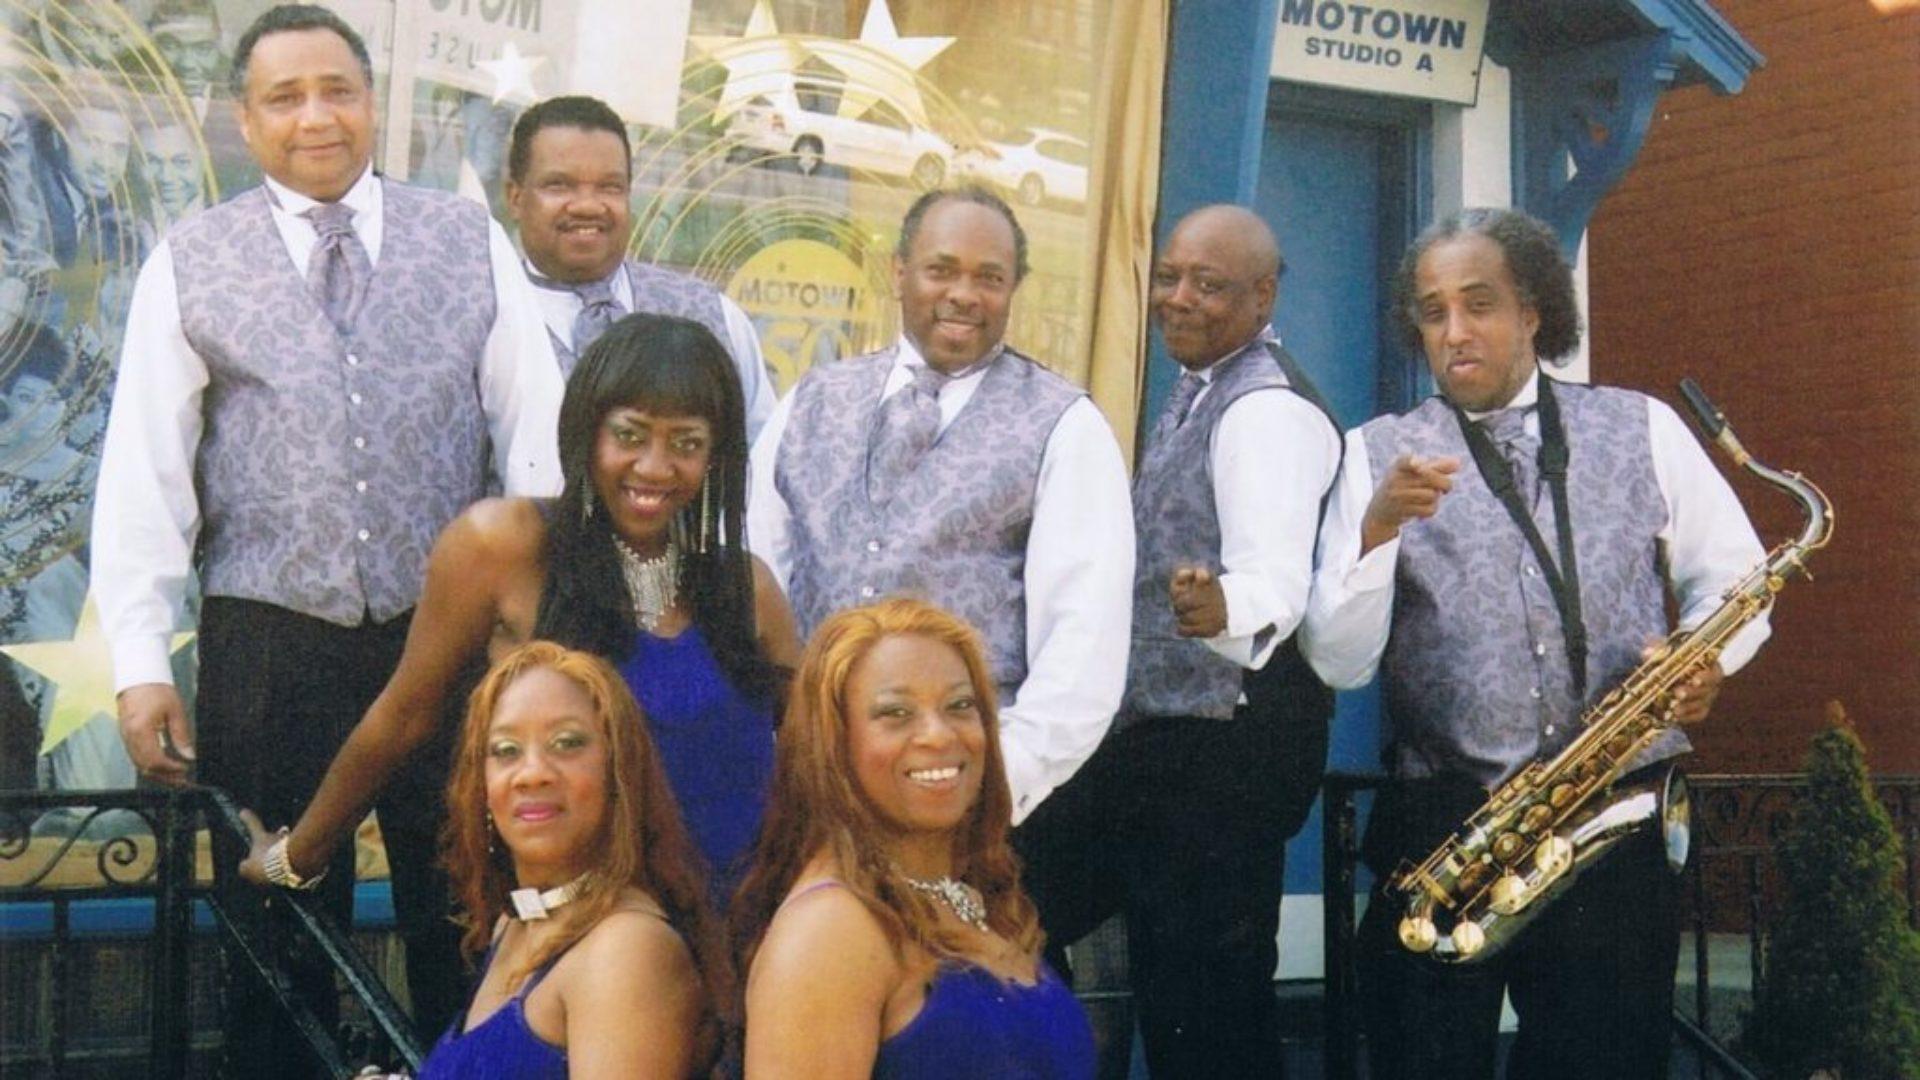 Jr. Walker's All Star Band